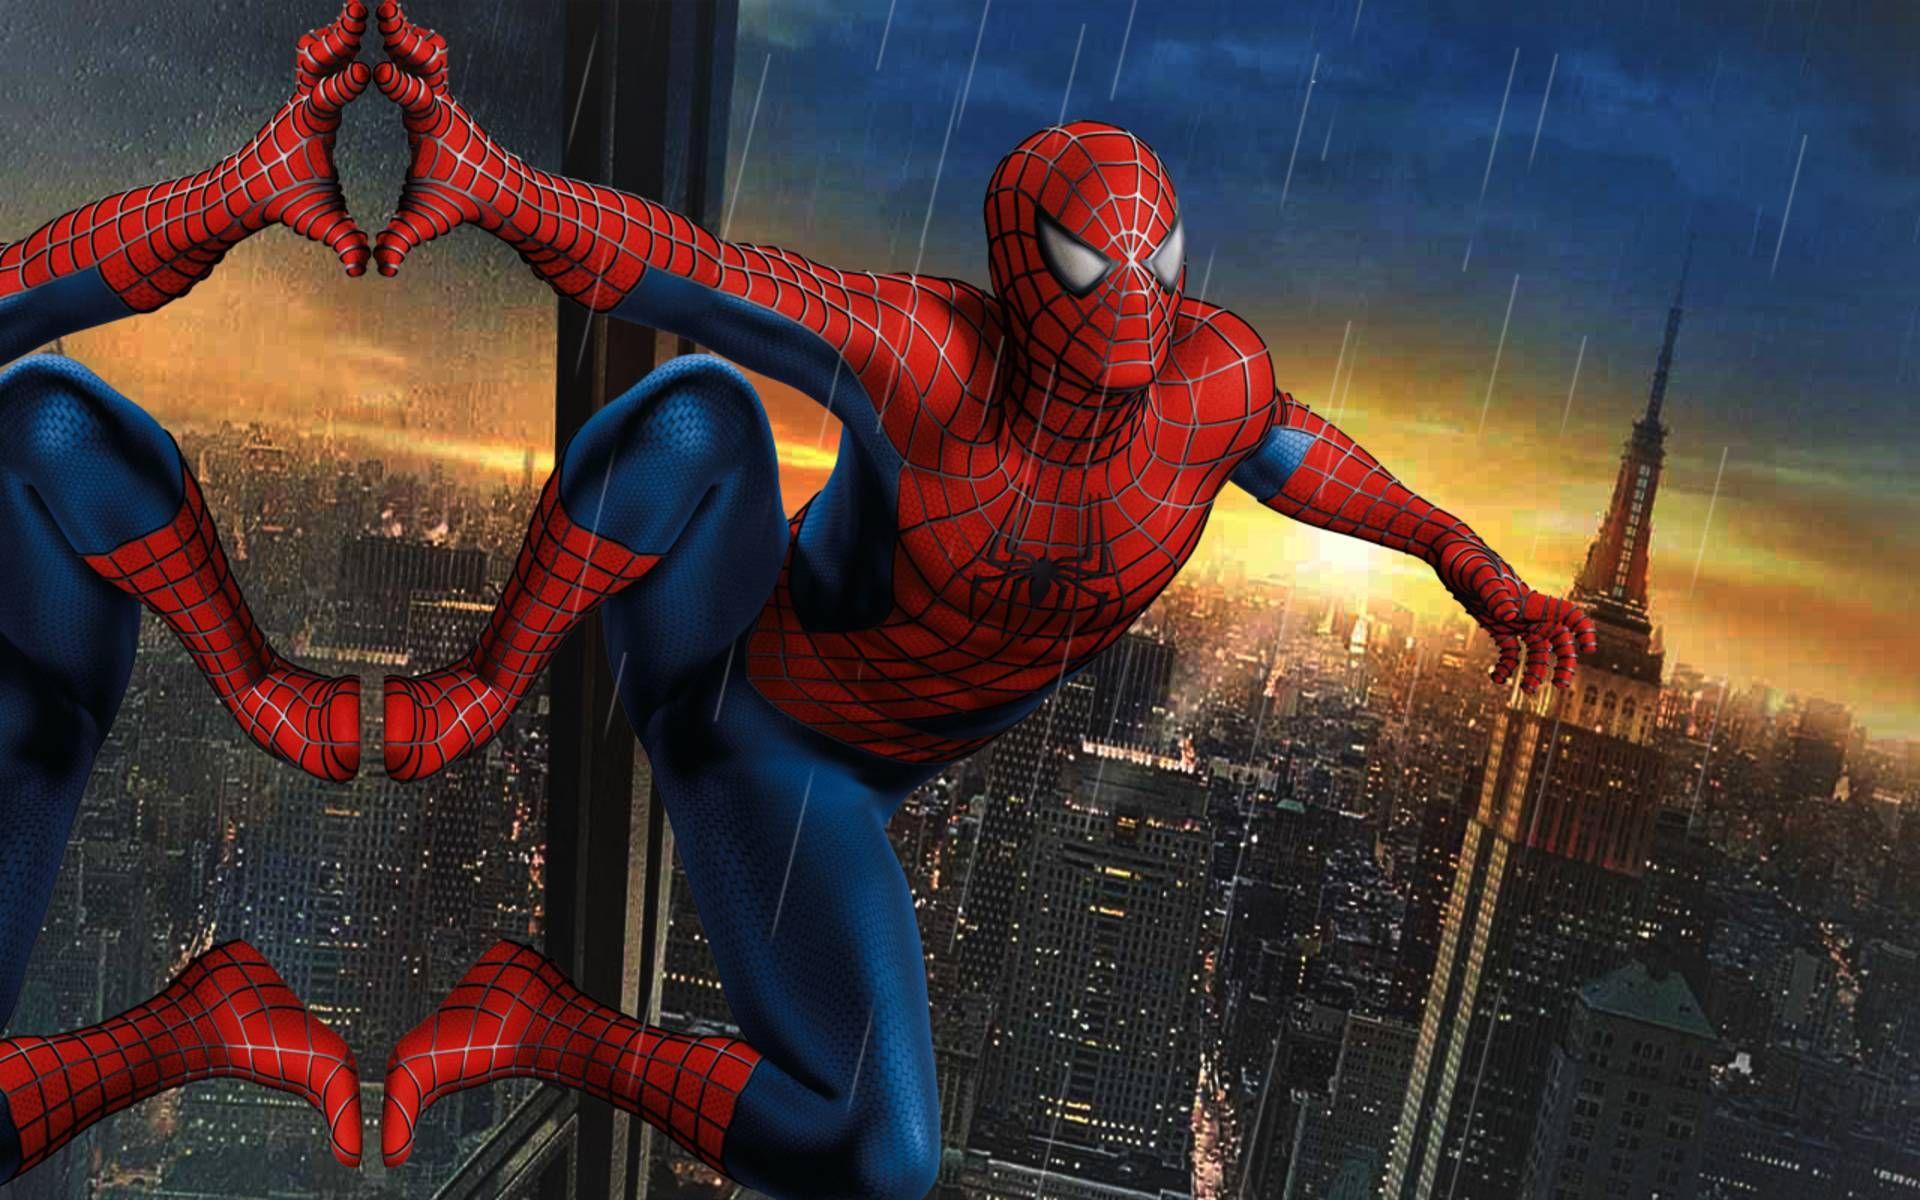 Spiderman Hd Wallpaper 1920x1080 Via Classy Bro Ultimate Spider Man Spiderman Bilder